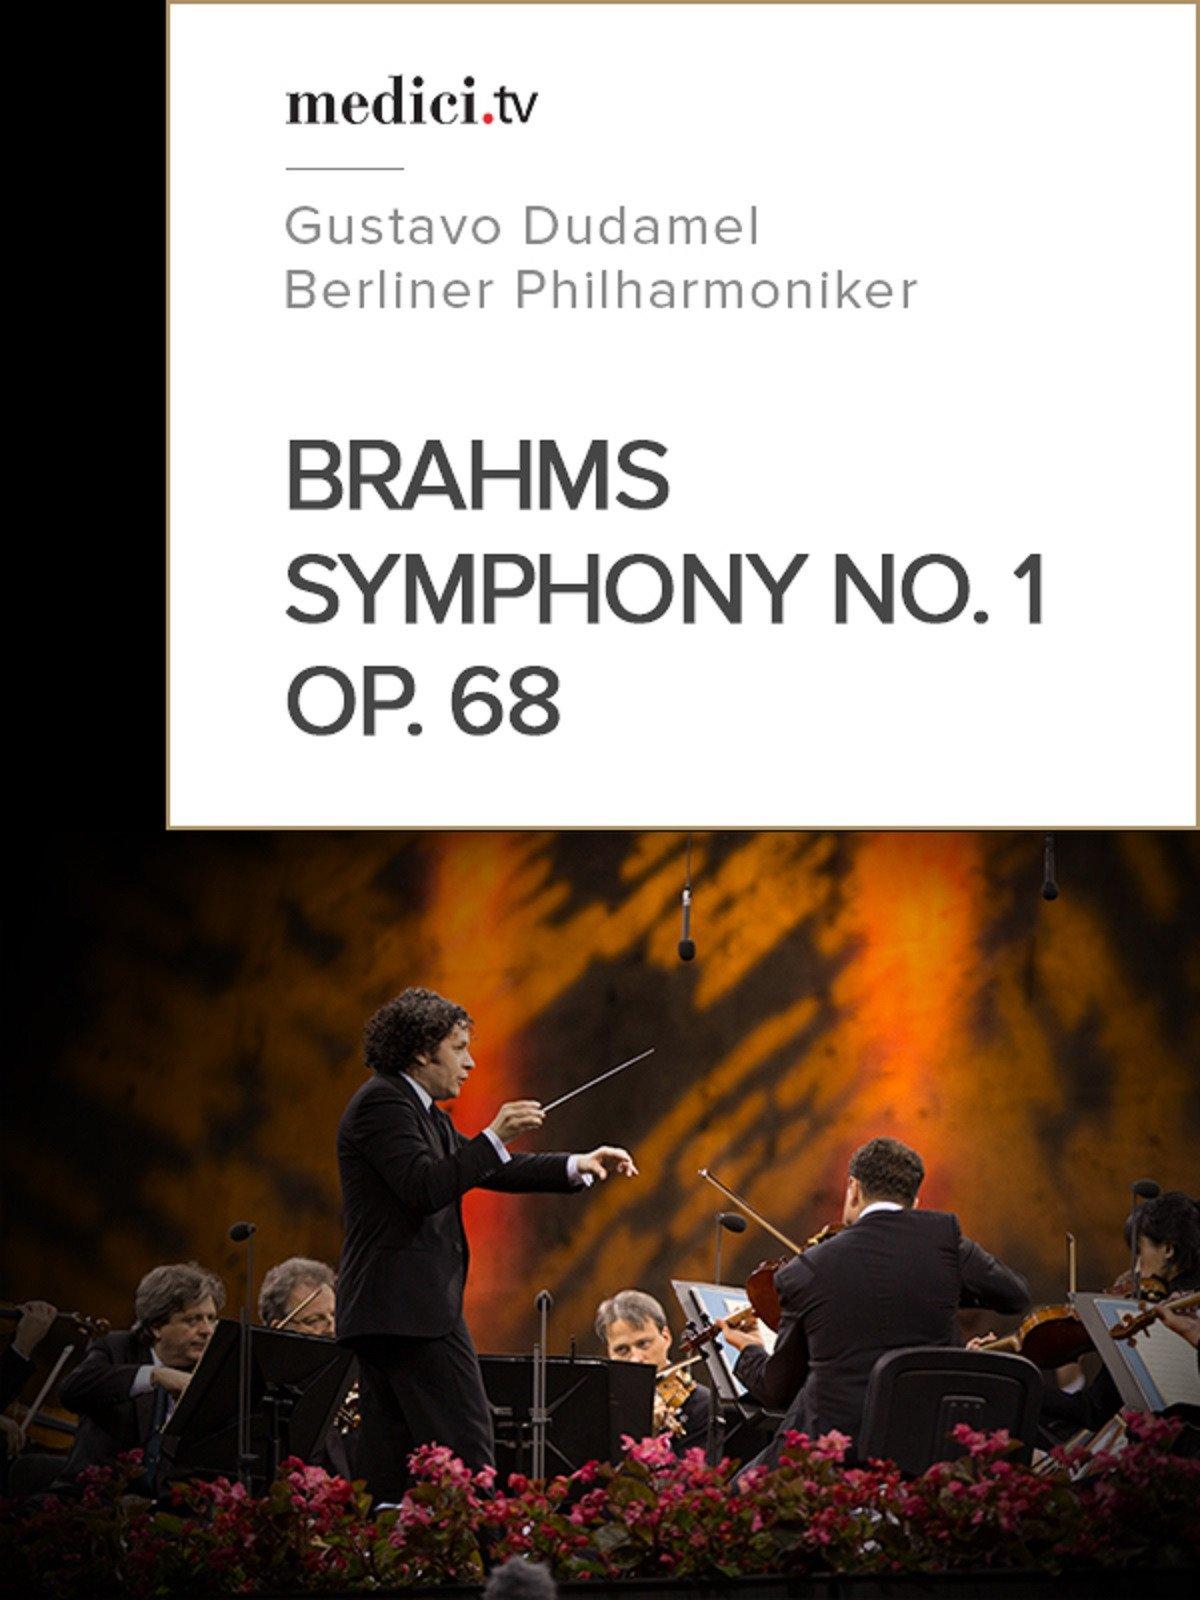 Brahms, Symphony No.1, Op.68